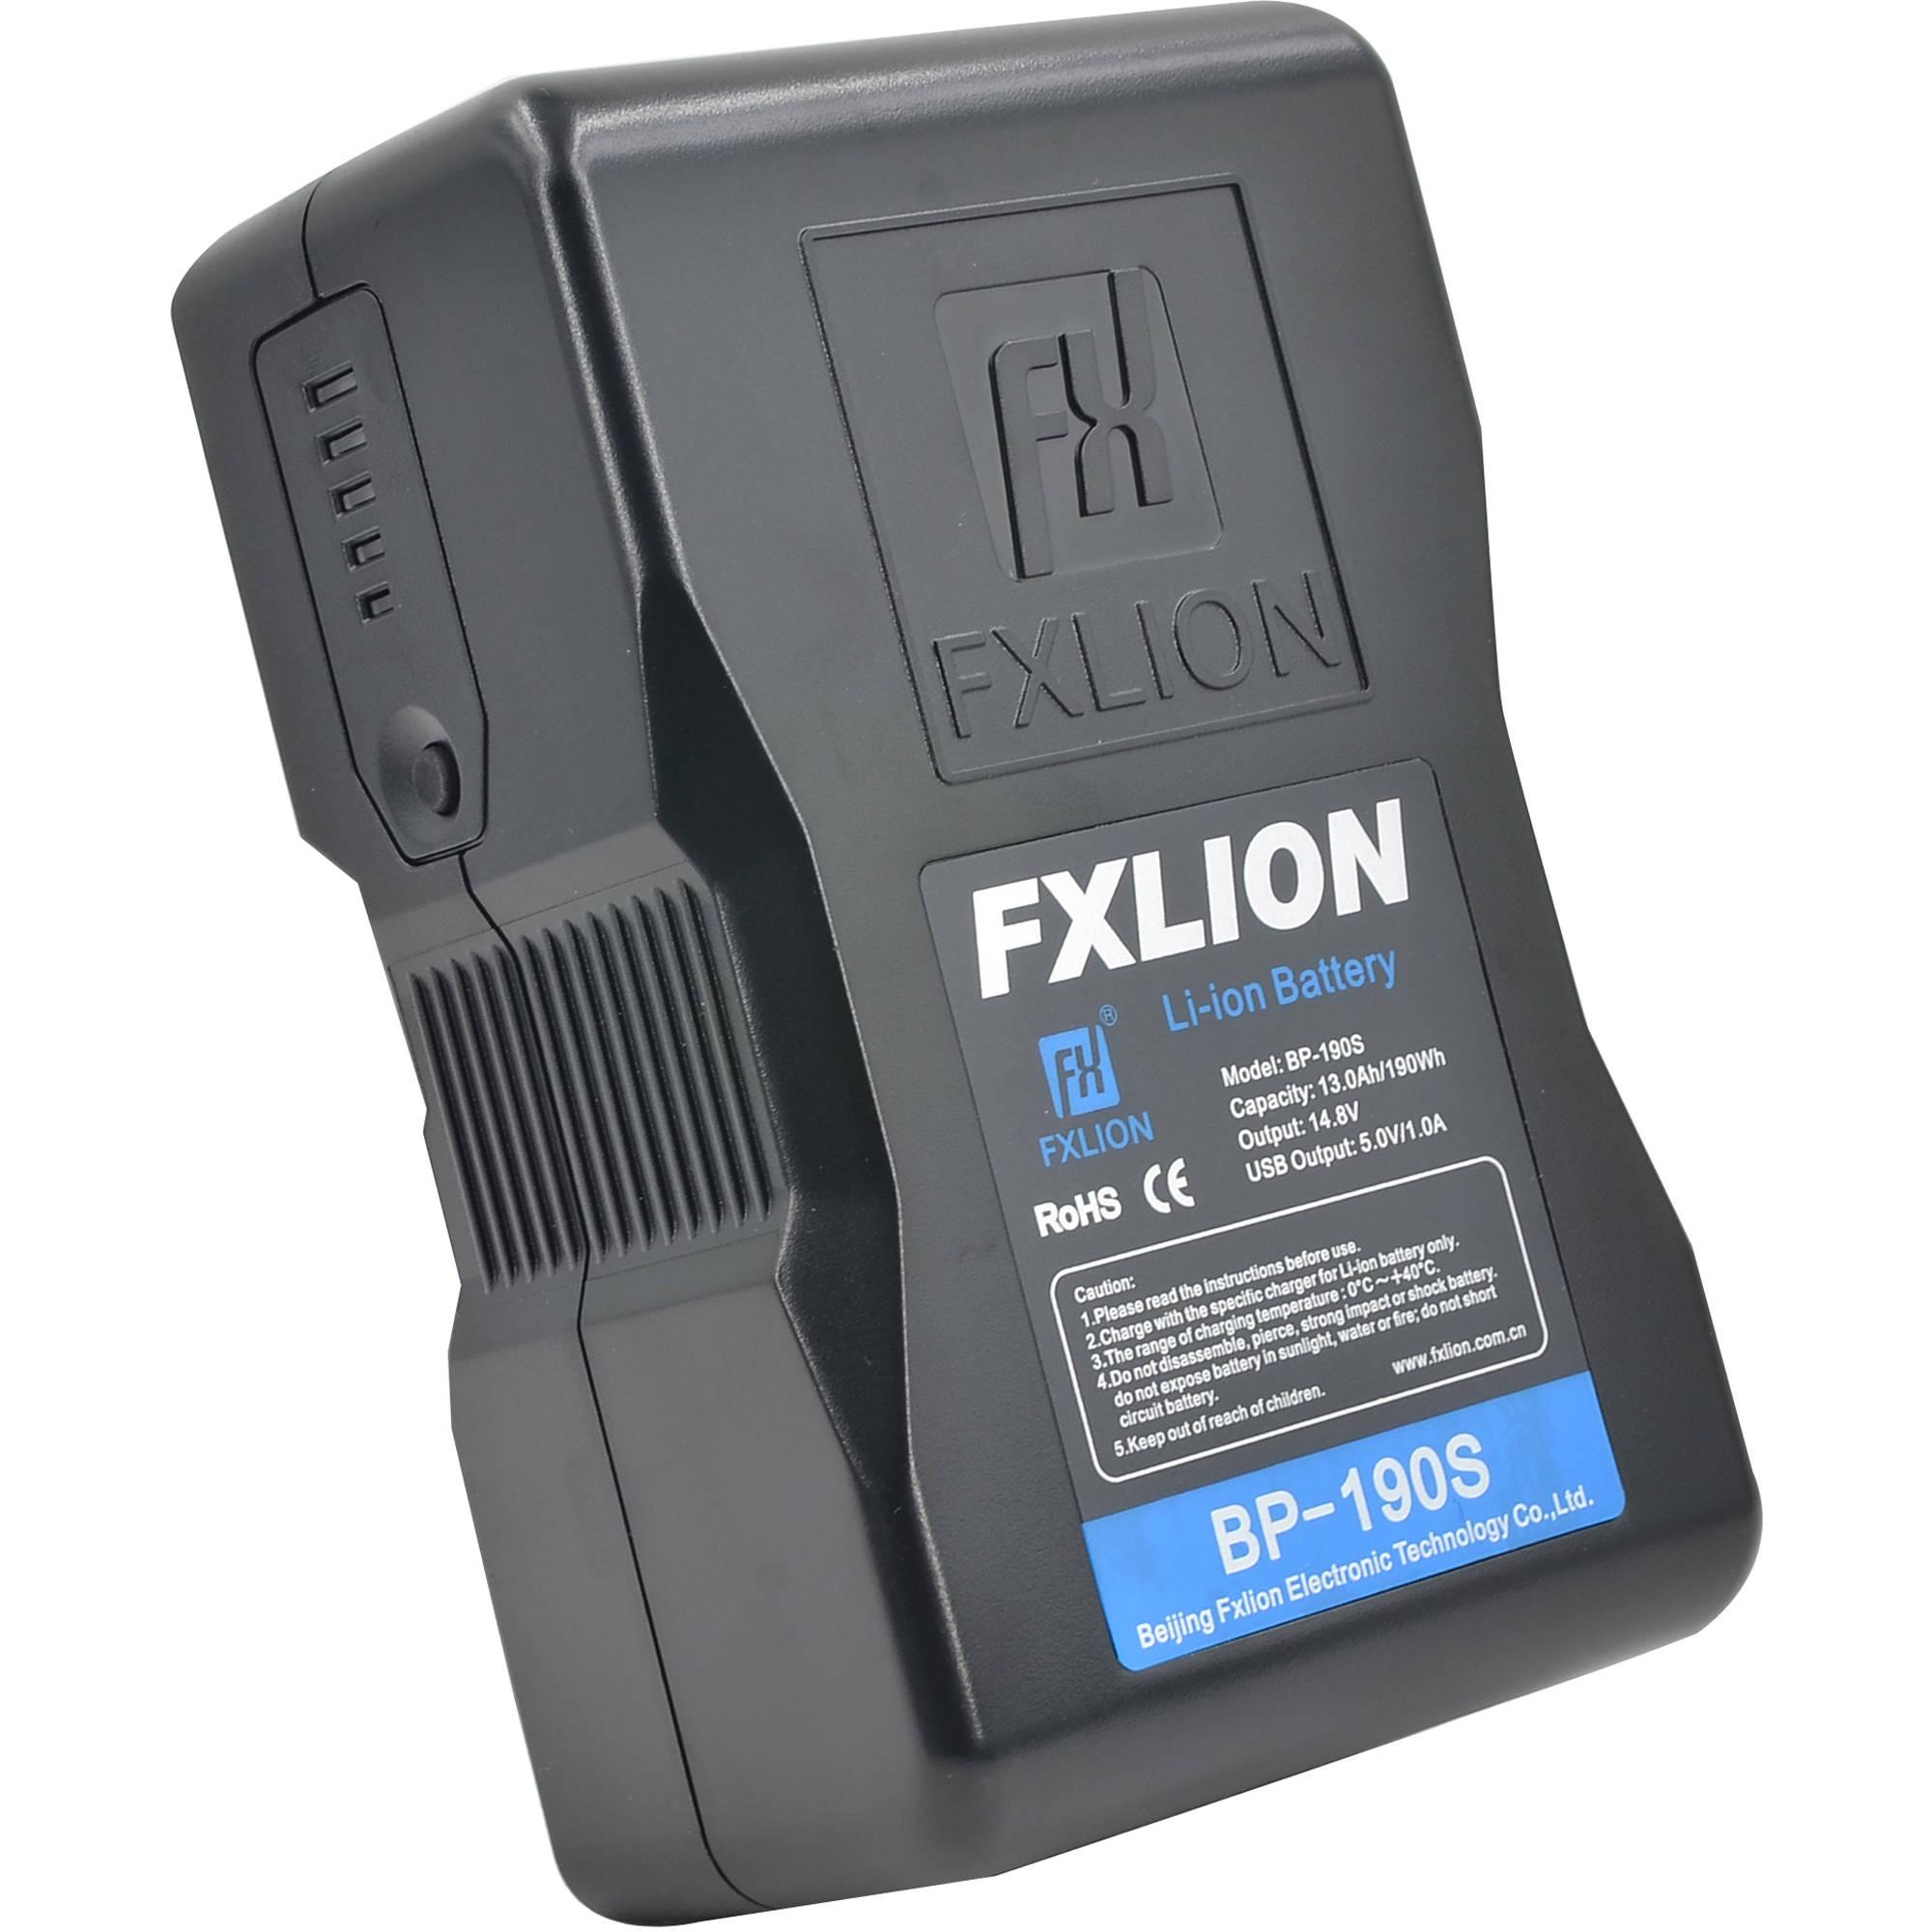 Fxlion Cool Black Series BP 190S 148V Lithium Ion